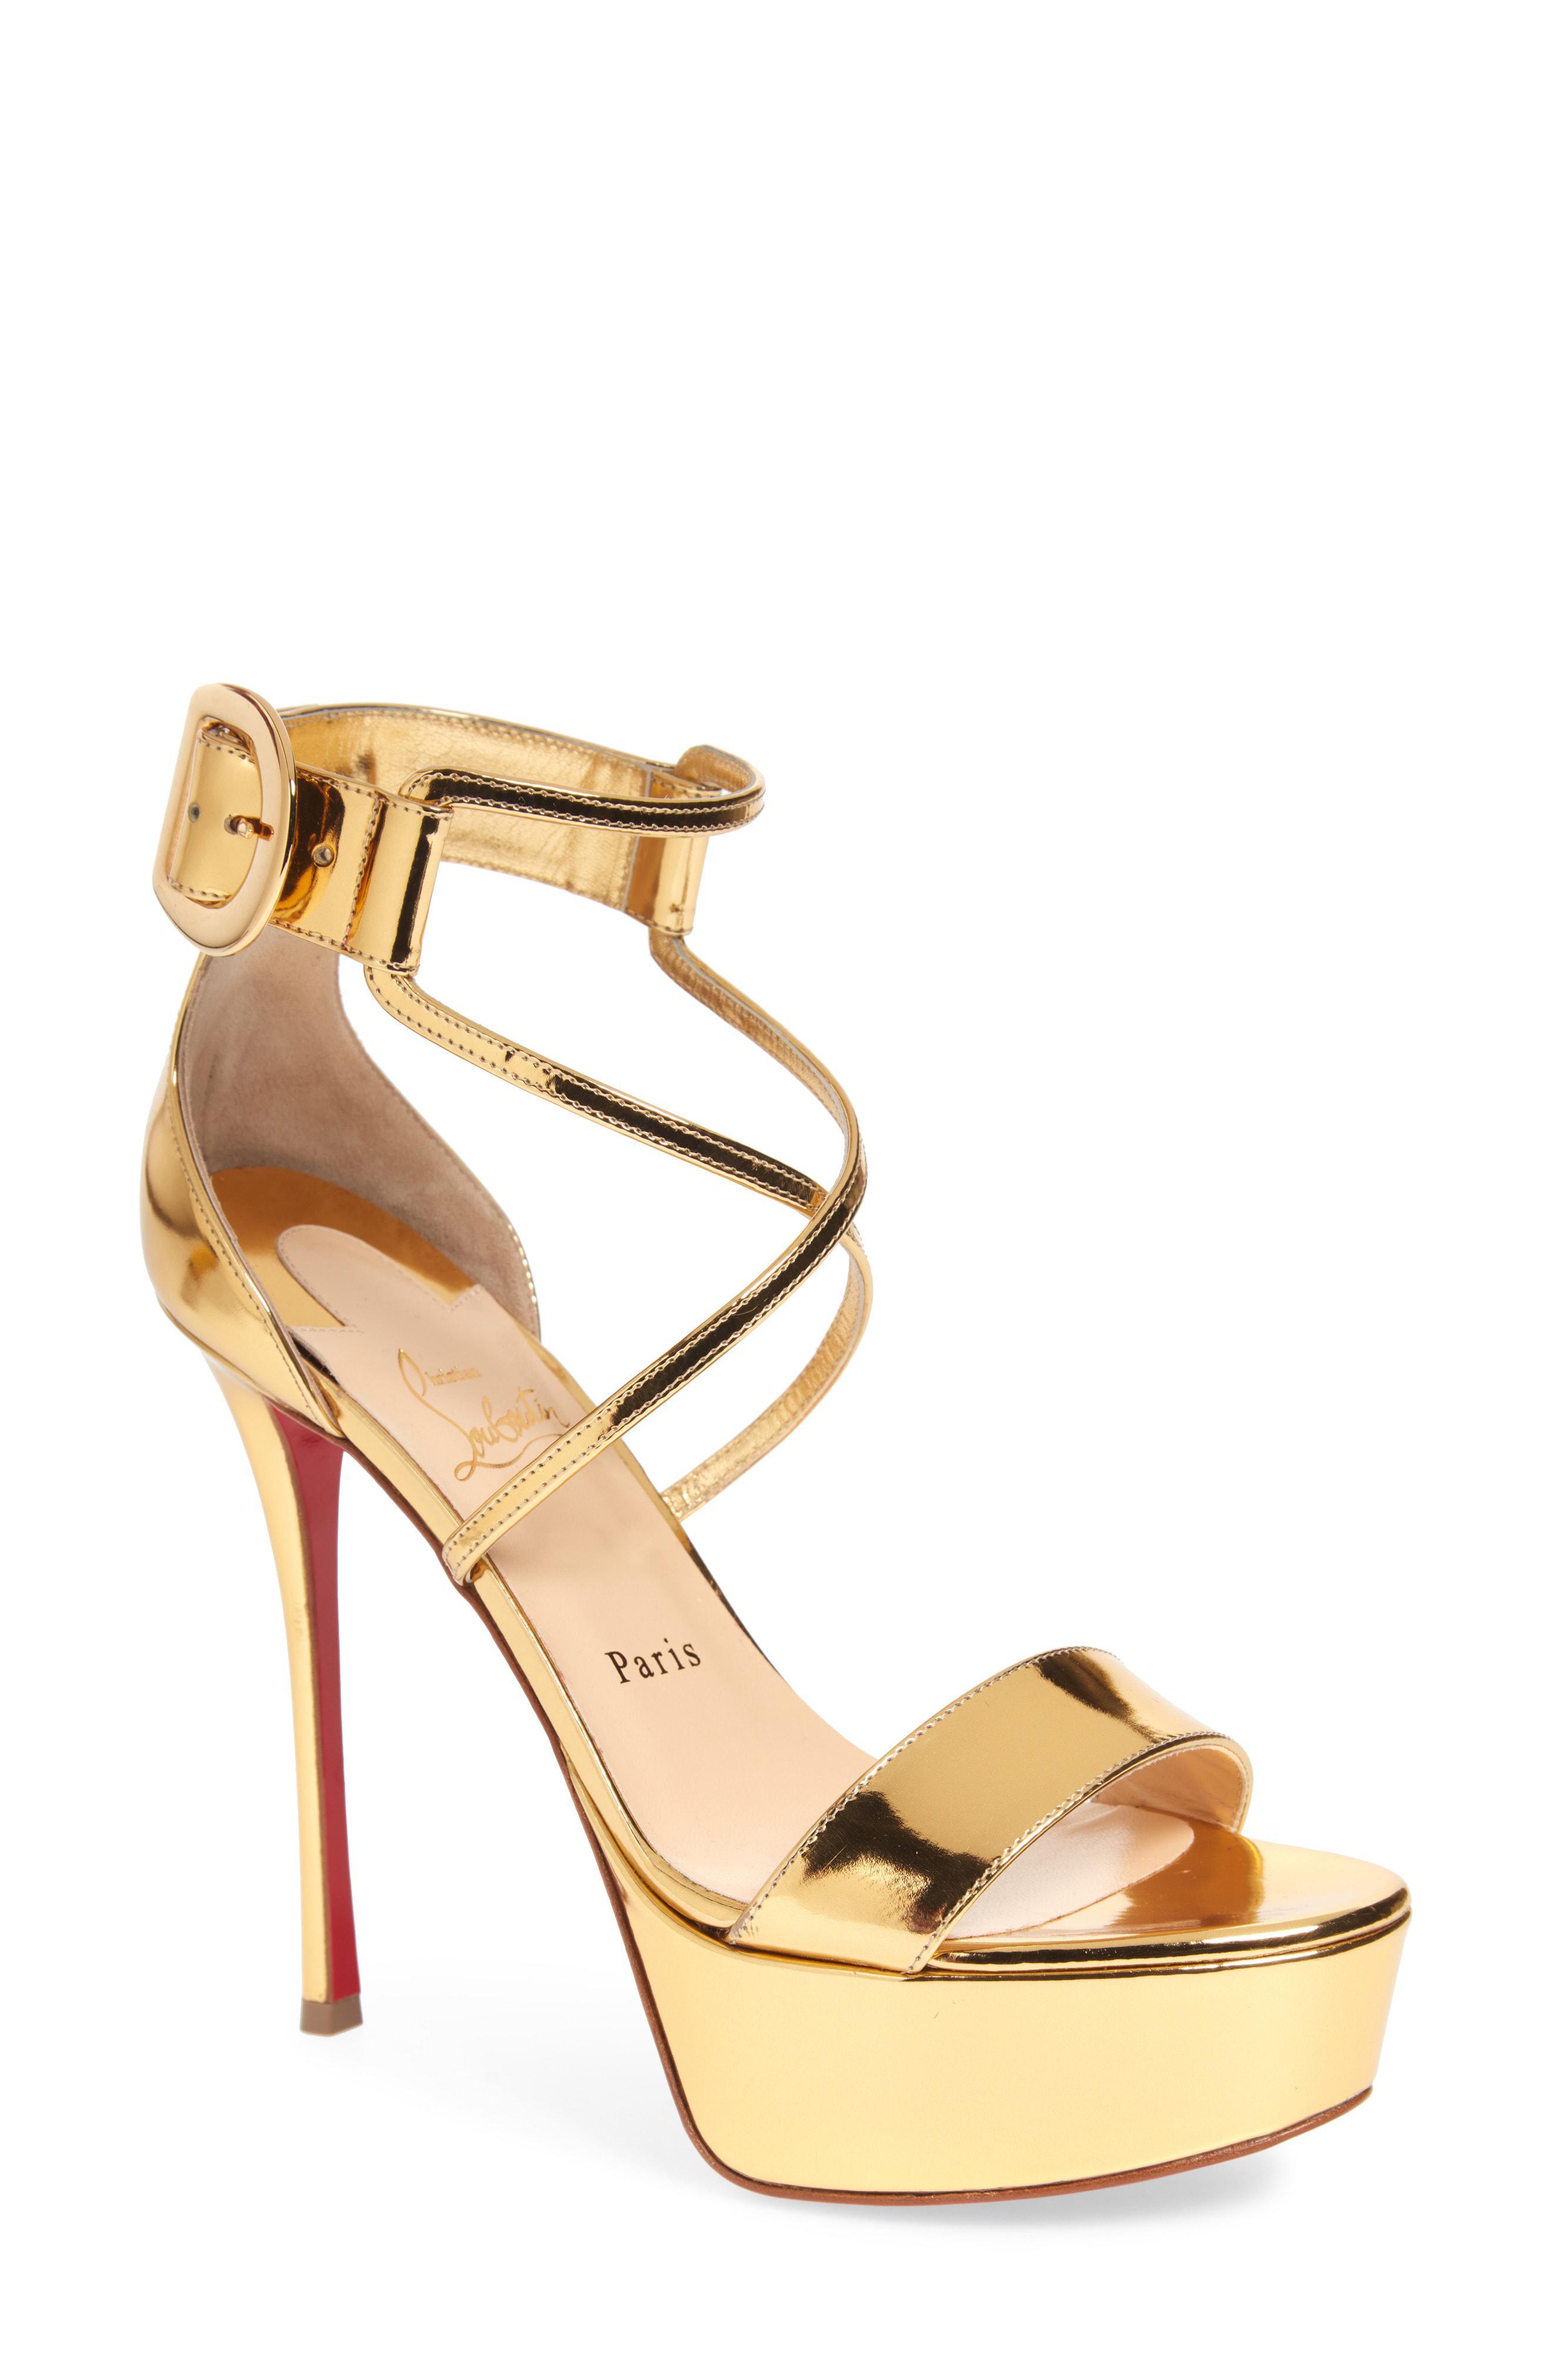 d309b2515a08 Lyst - Christian Louboutin Choca Platform Sandal in Metallic